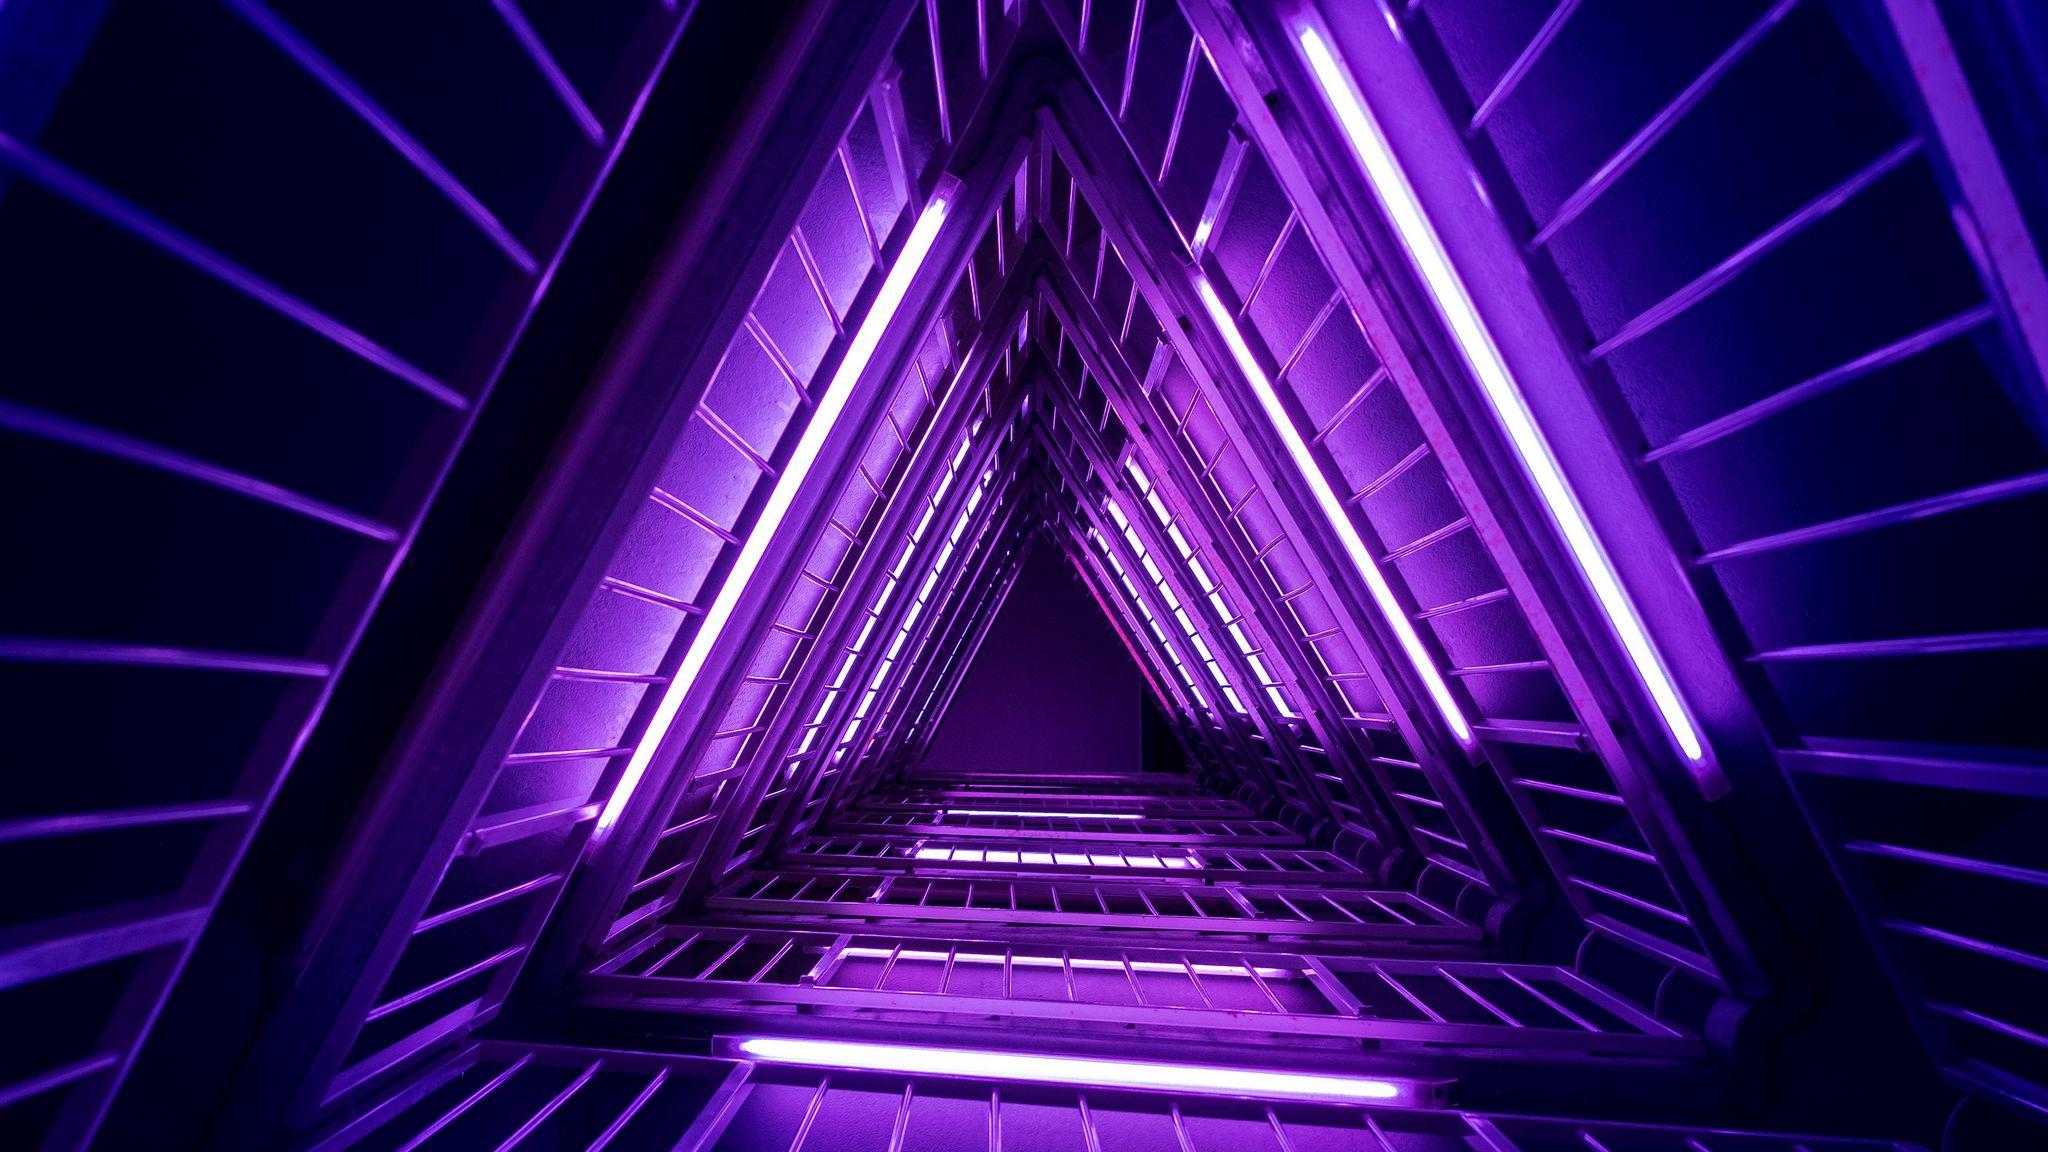 2048x1152 Wallpaper ladder, purple, light